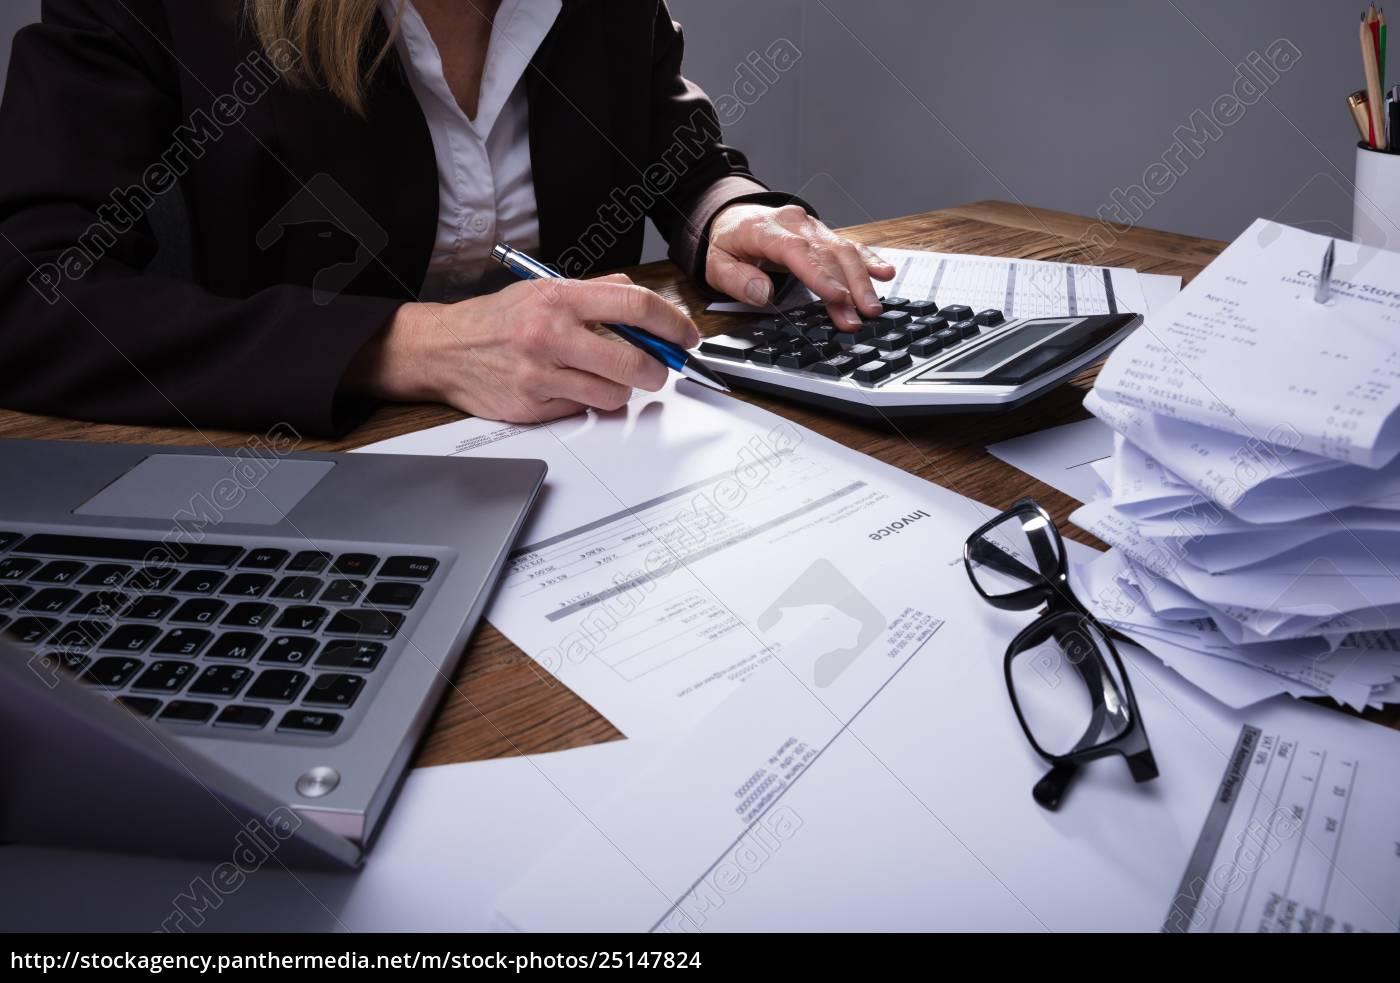 businessperson, calculating, invoice - 25147824